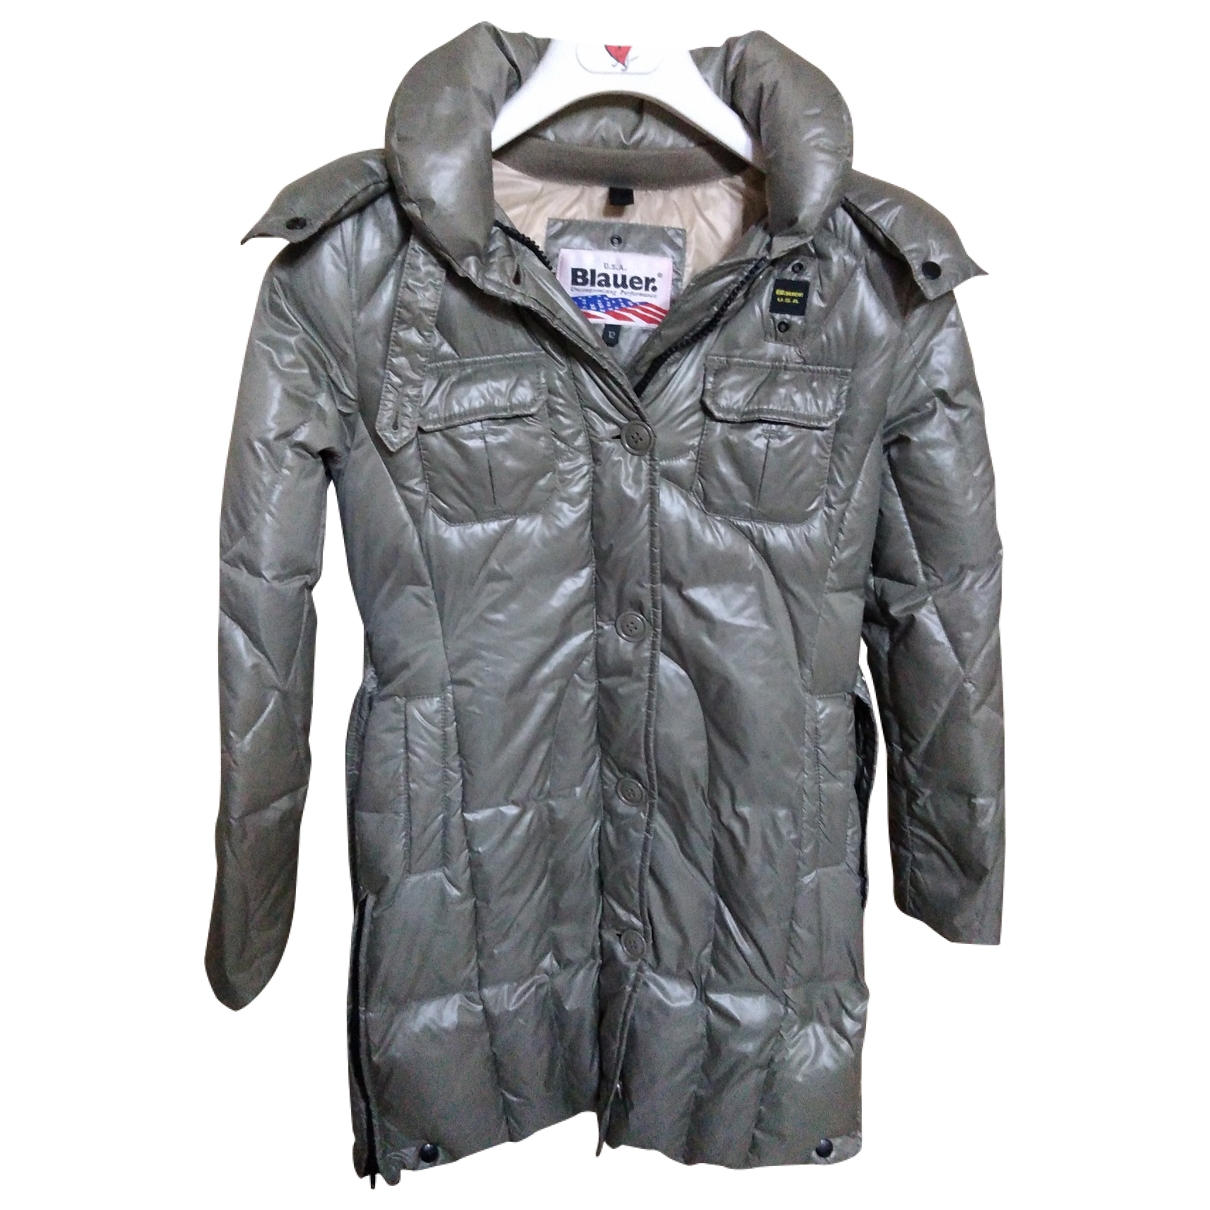 Blauer \N Green jacket & coat for Kids 12 years - XS FR